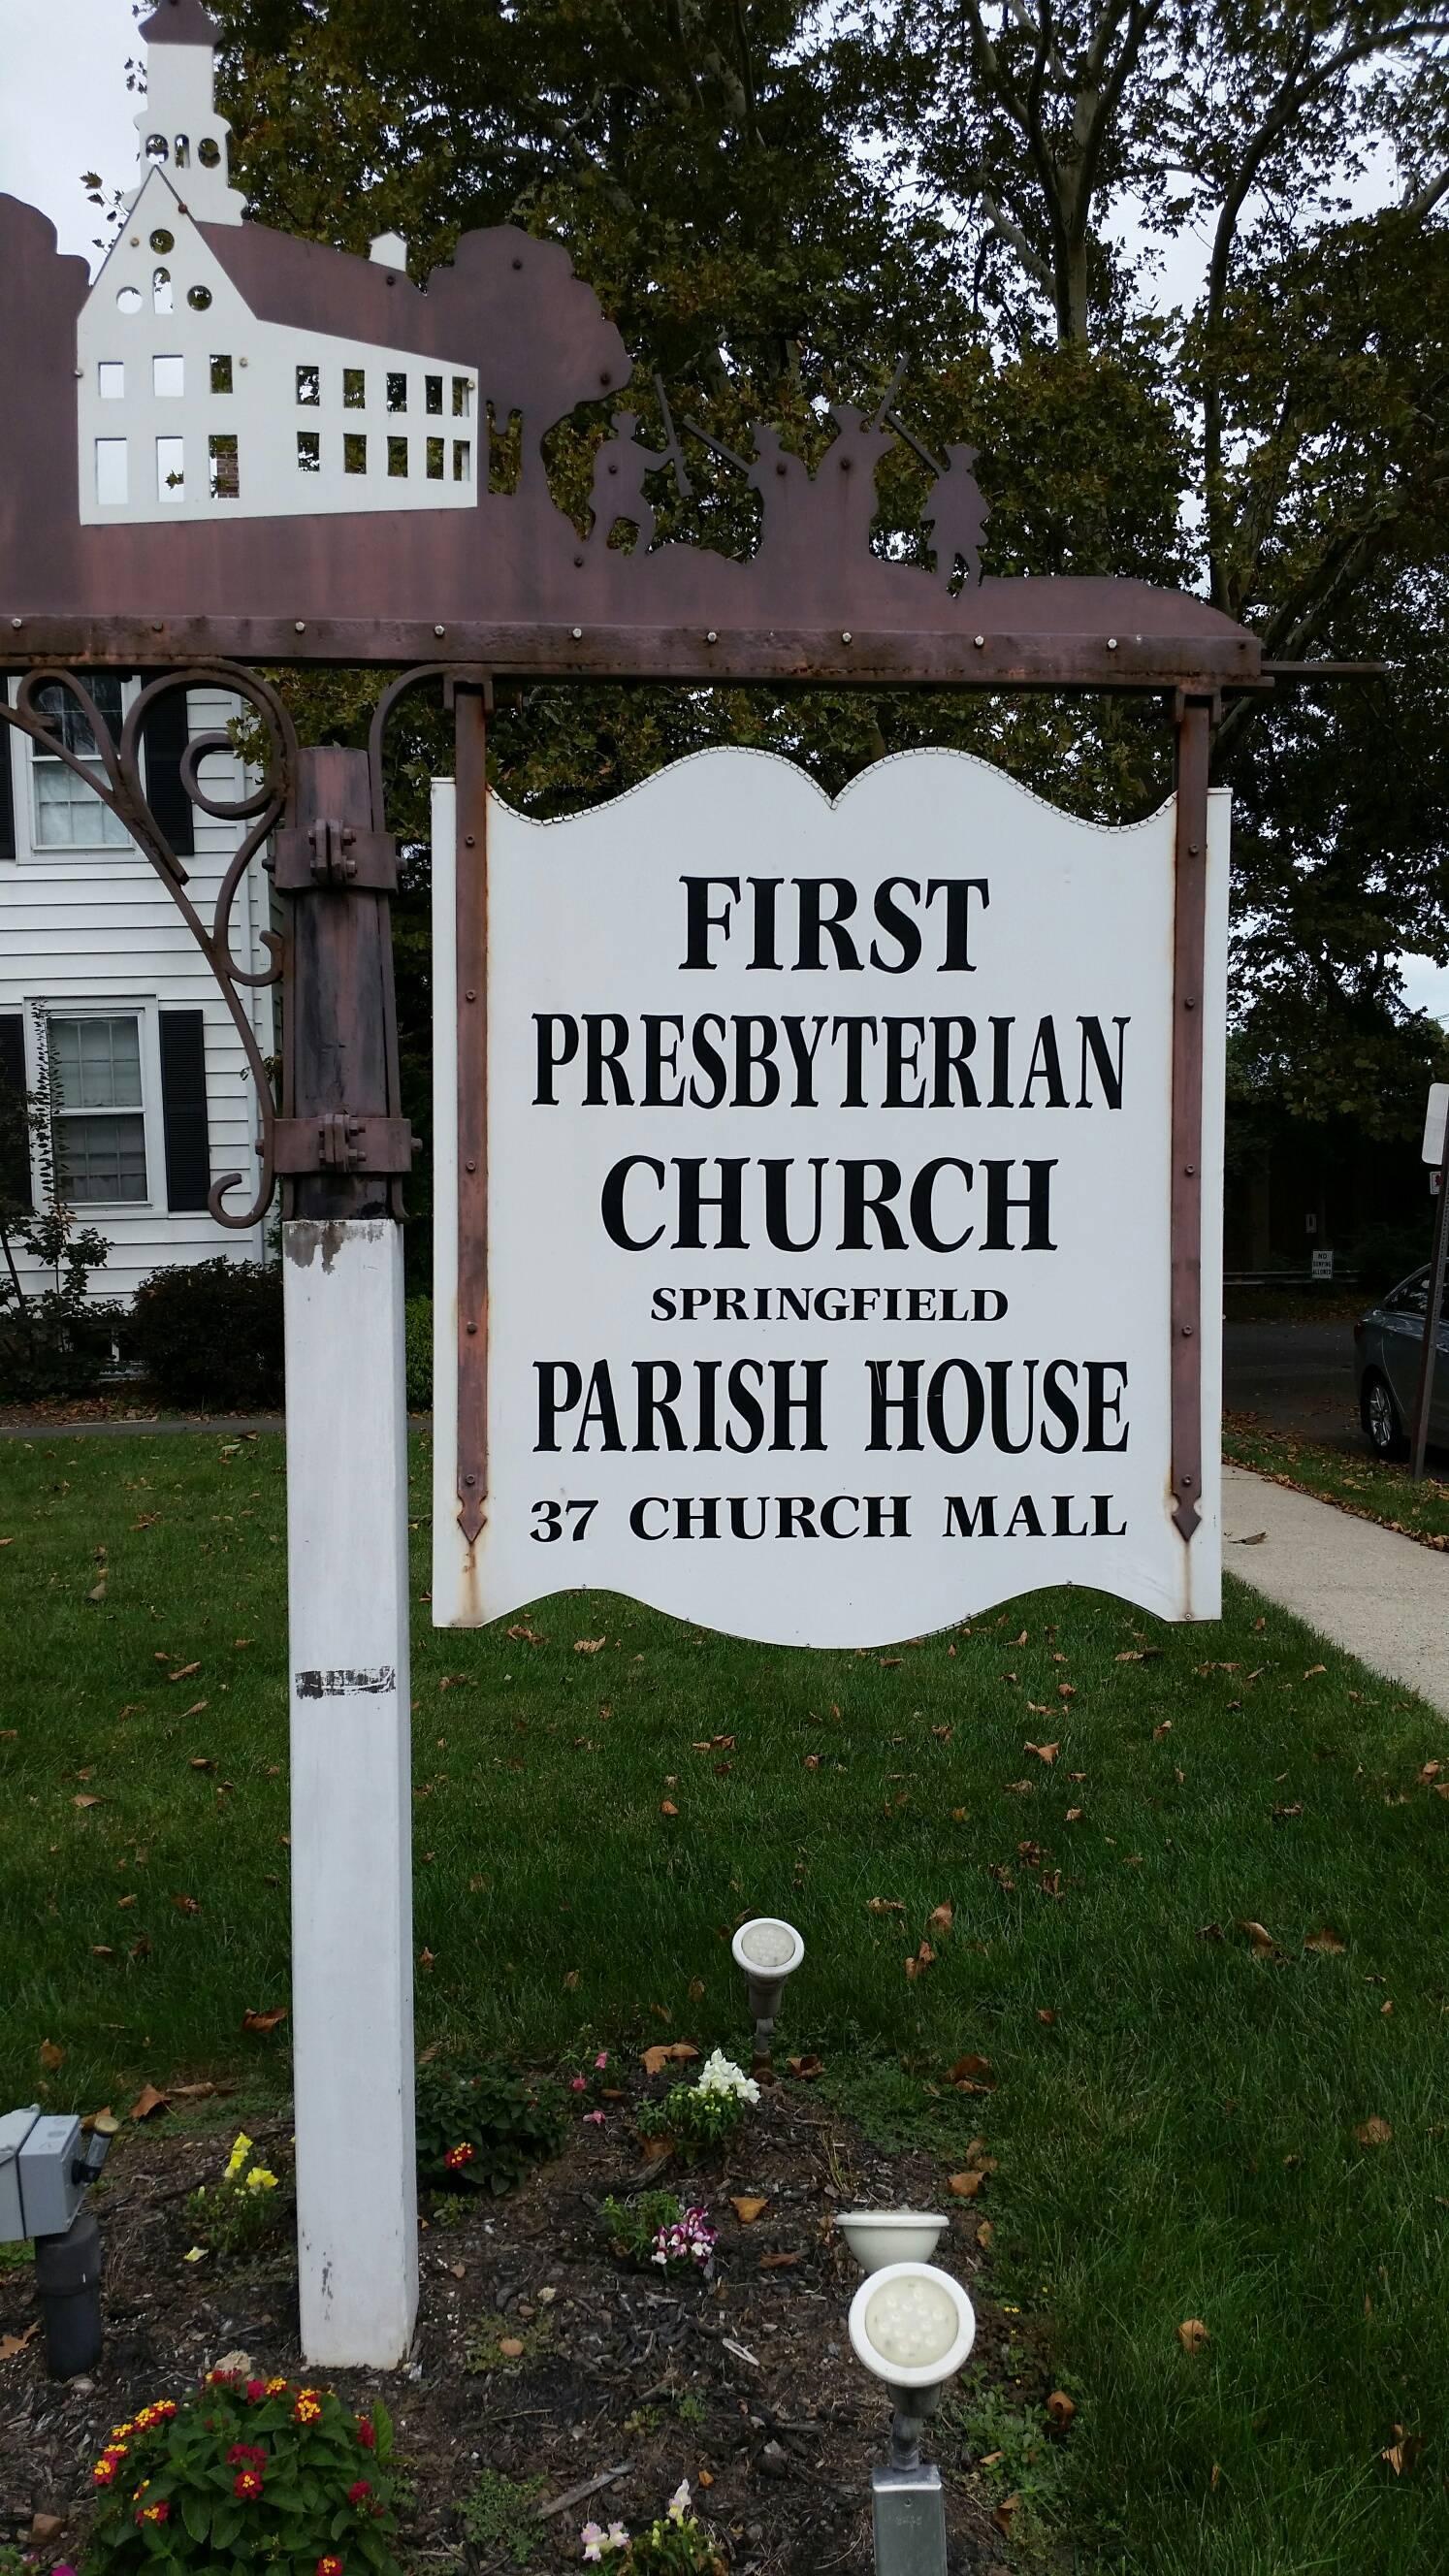 8ad7063c3ad81ebb3d6f_Parish_House_sign.jpg